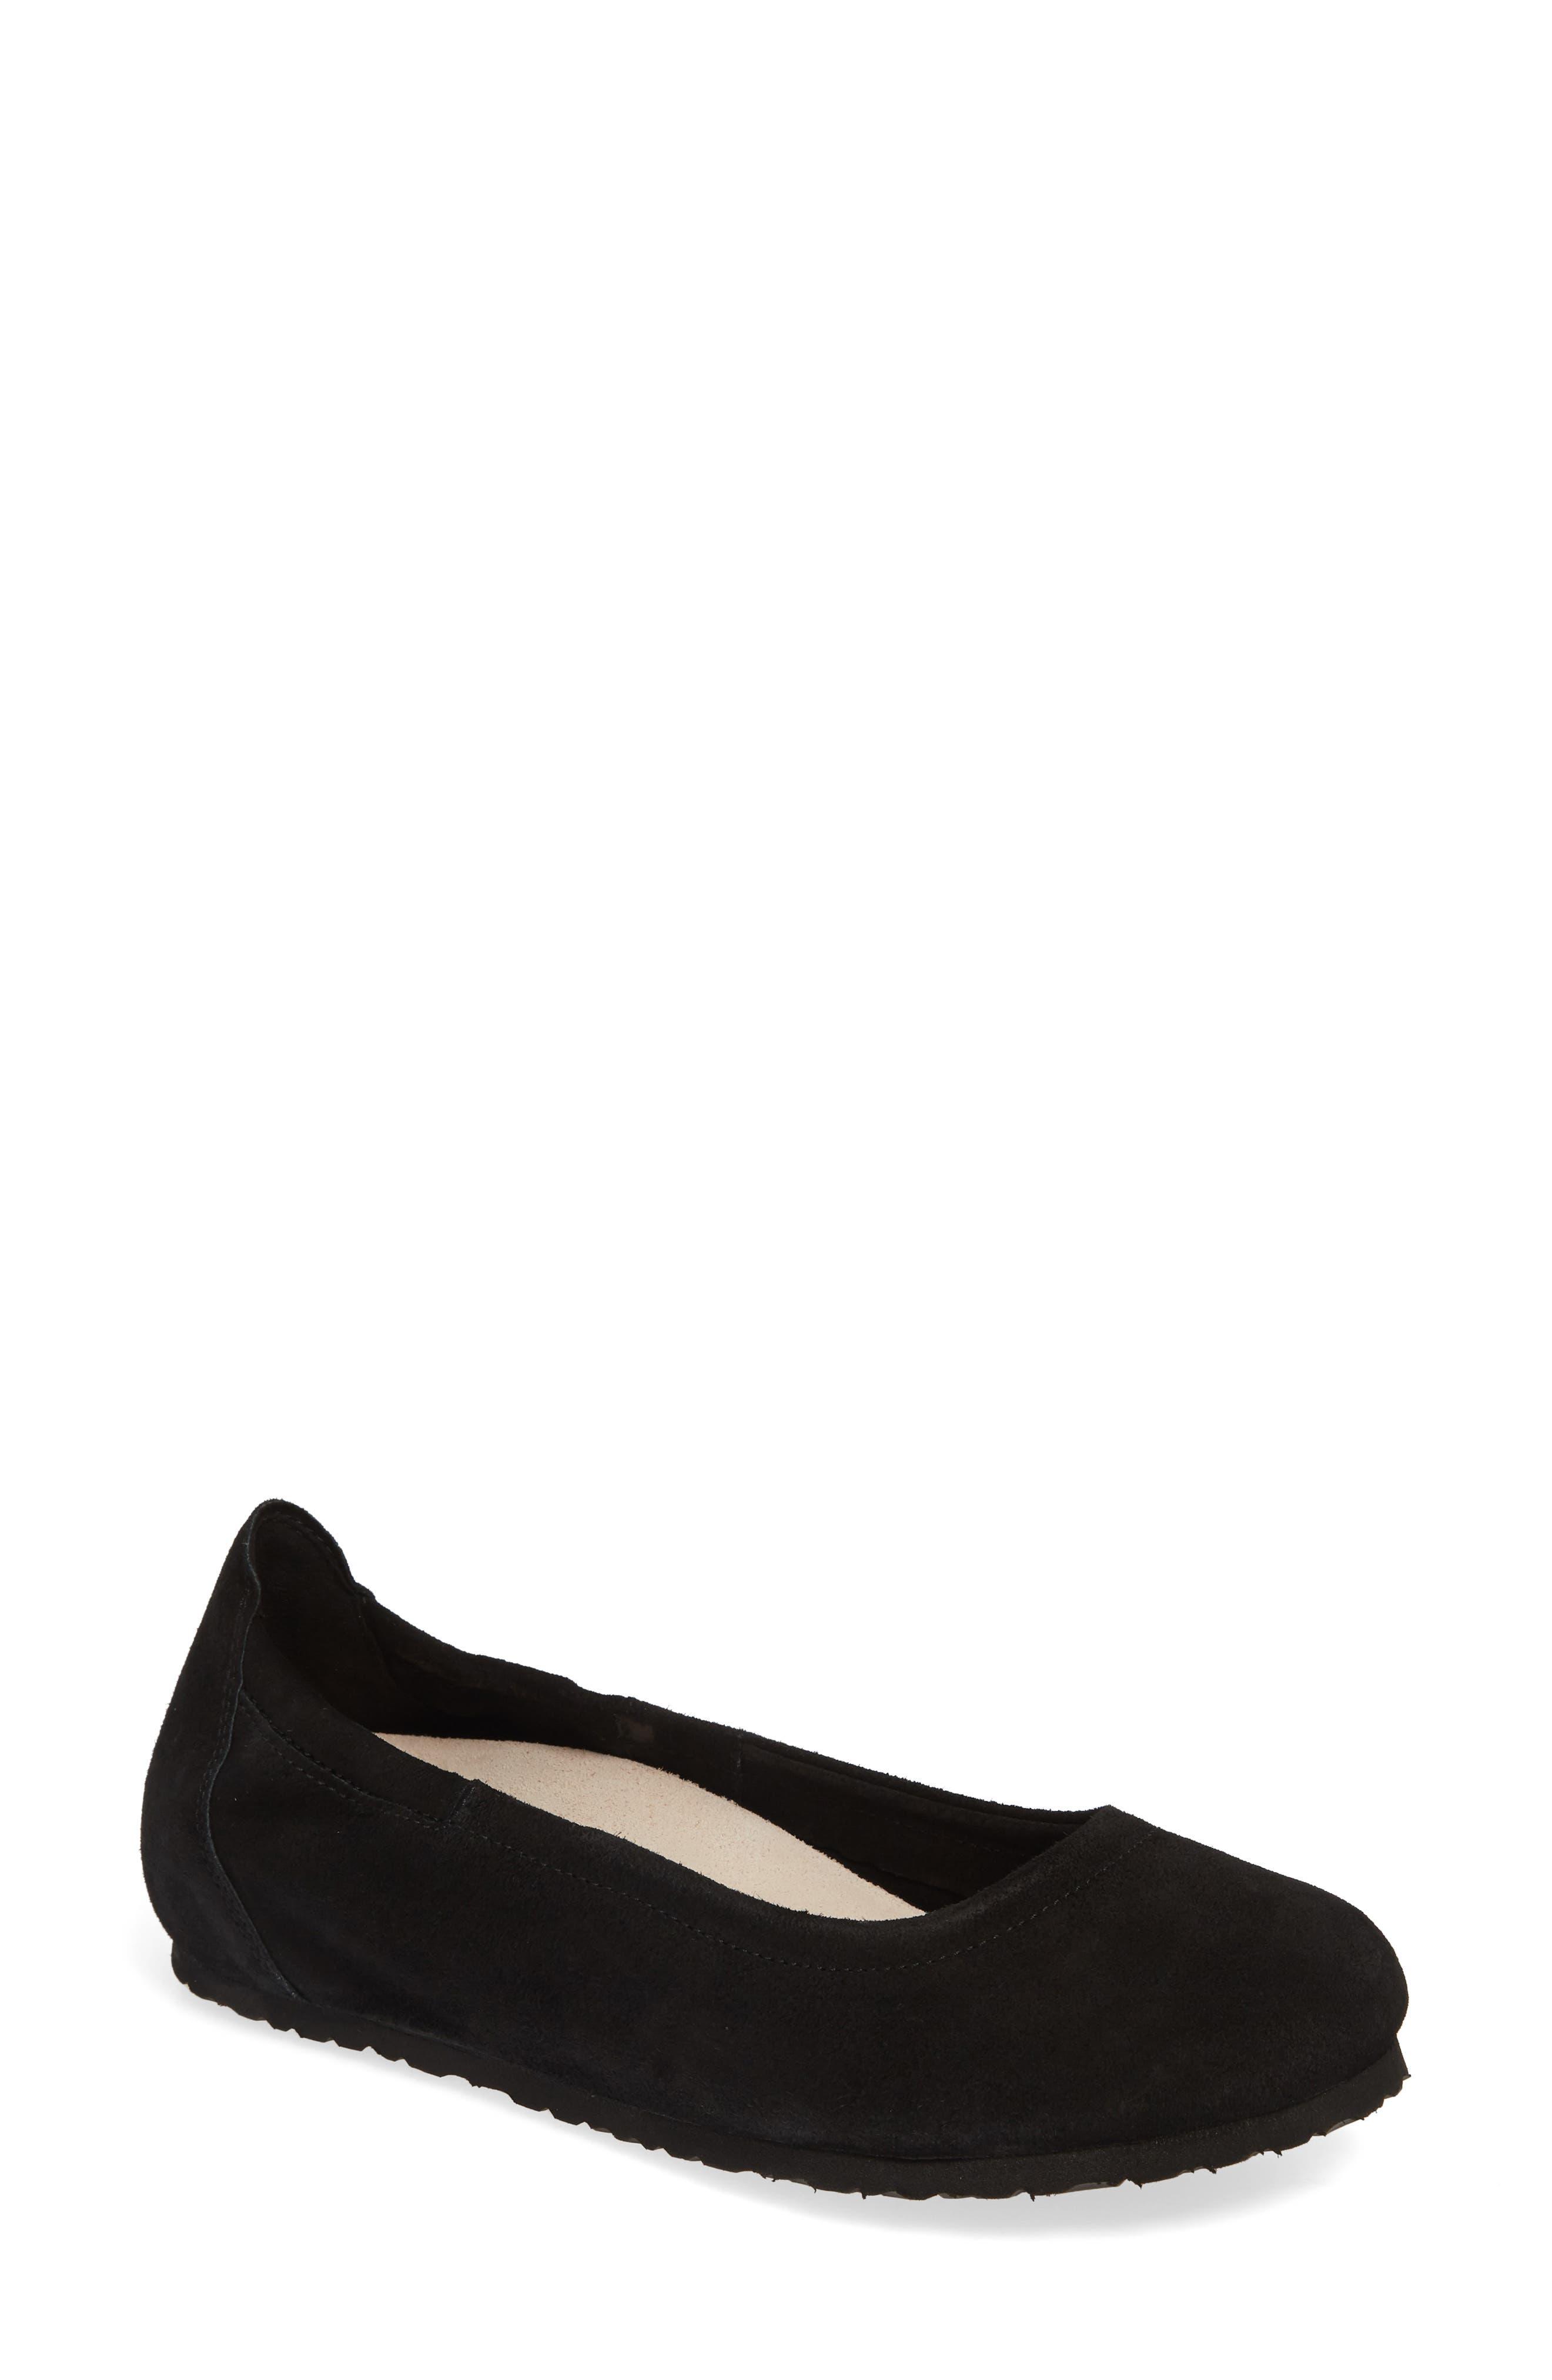 Birkenstock Celina Ii Ballet Flat,5.5 - Black